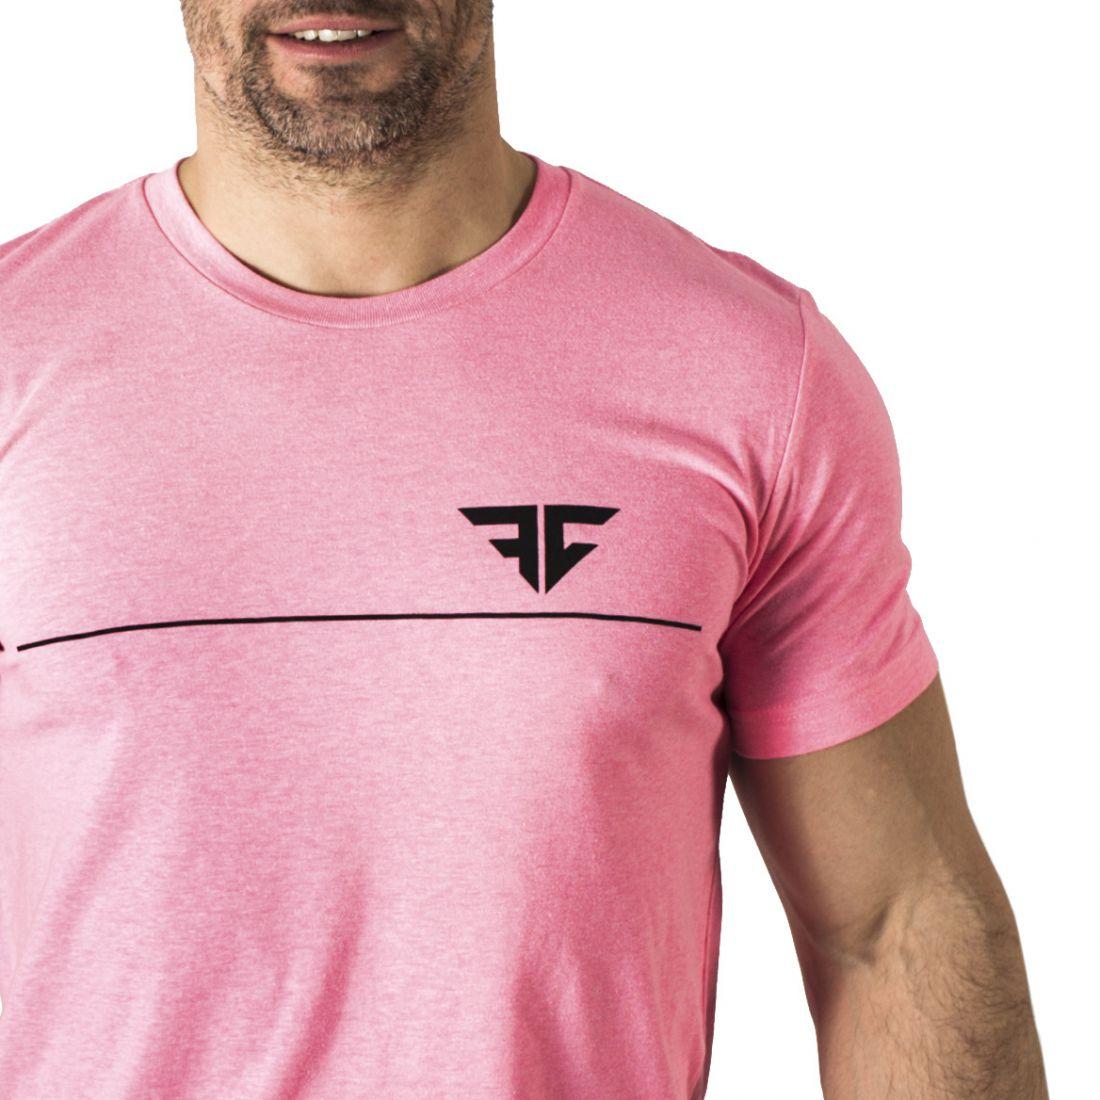 eee04365773ccc Mens Neon Pink T Shirt - DREAMWORKS